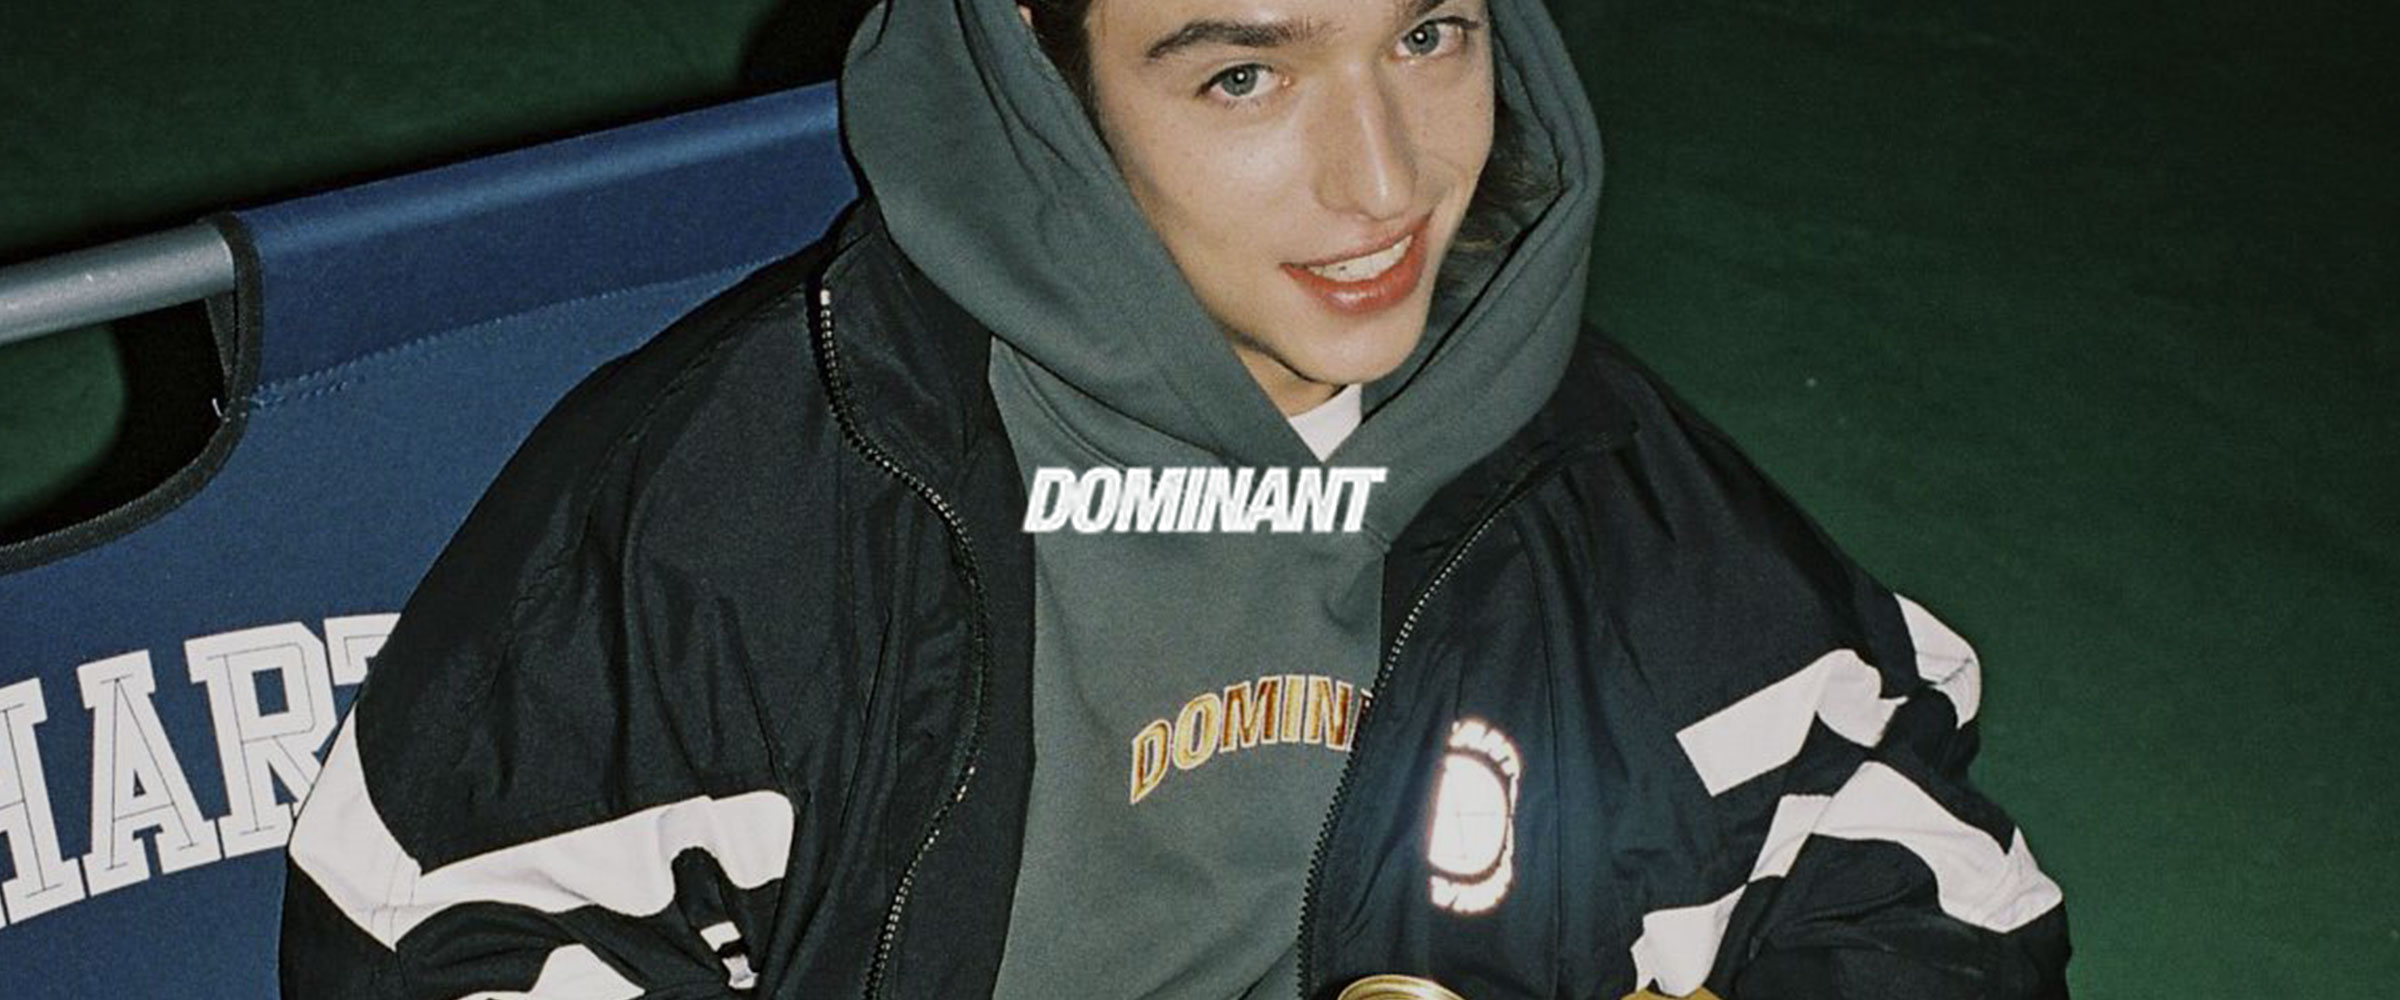 dominant.jpg